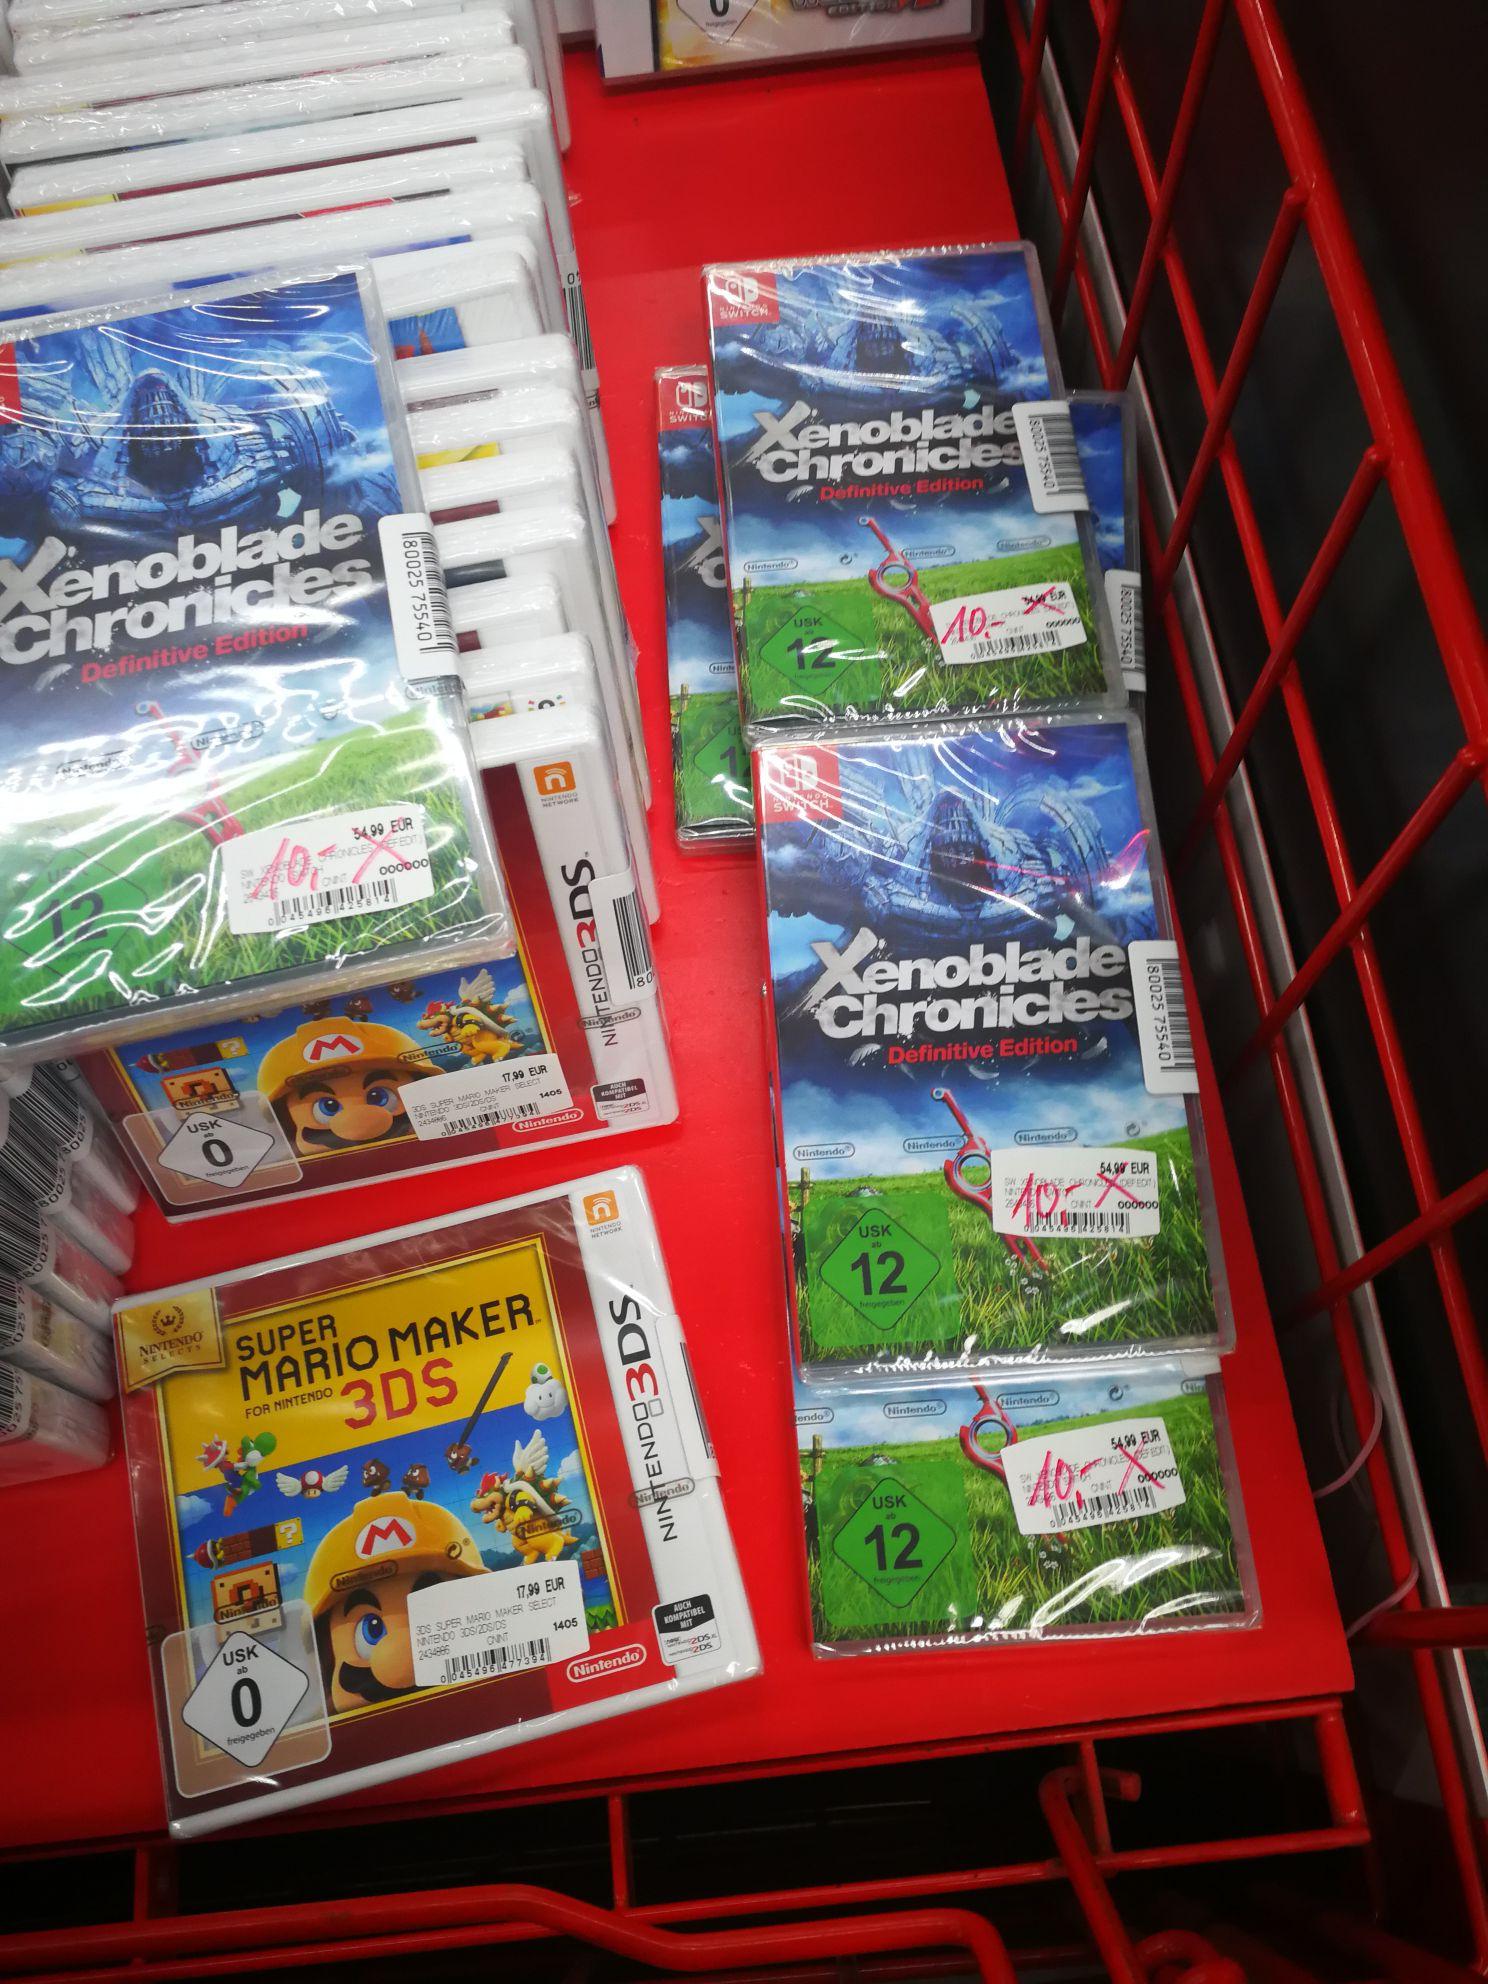 Lokal Media Markt WESERPARK Bremen - Xenoblade Cronicles Definitive Edition (Nintendo Switch)